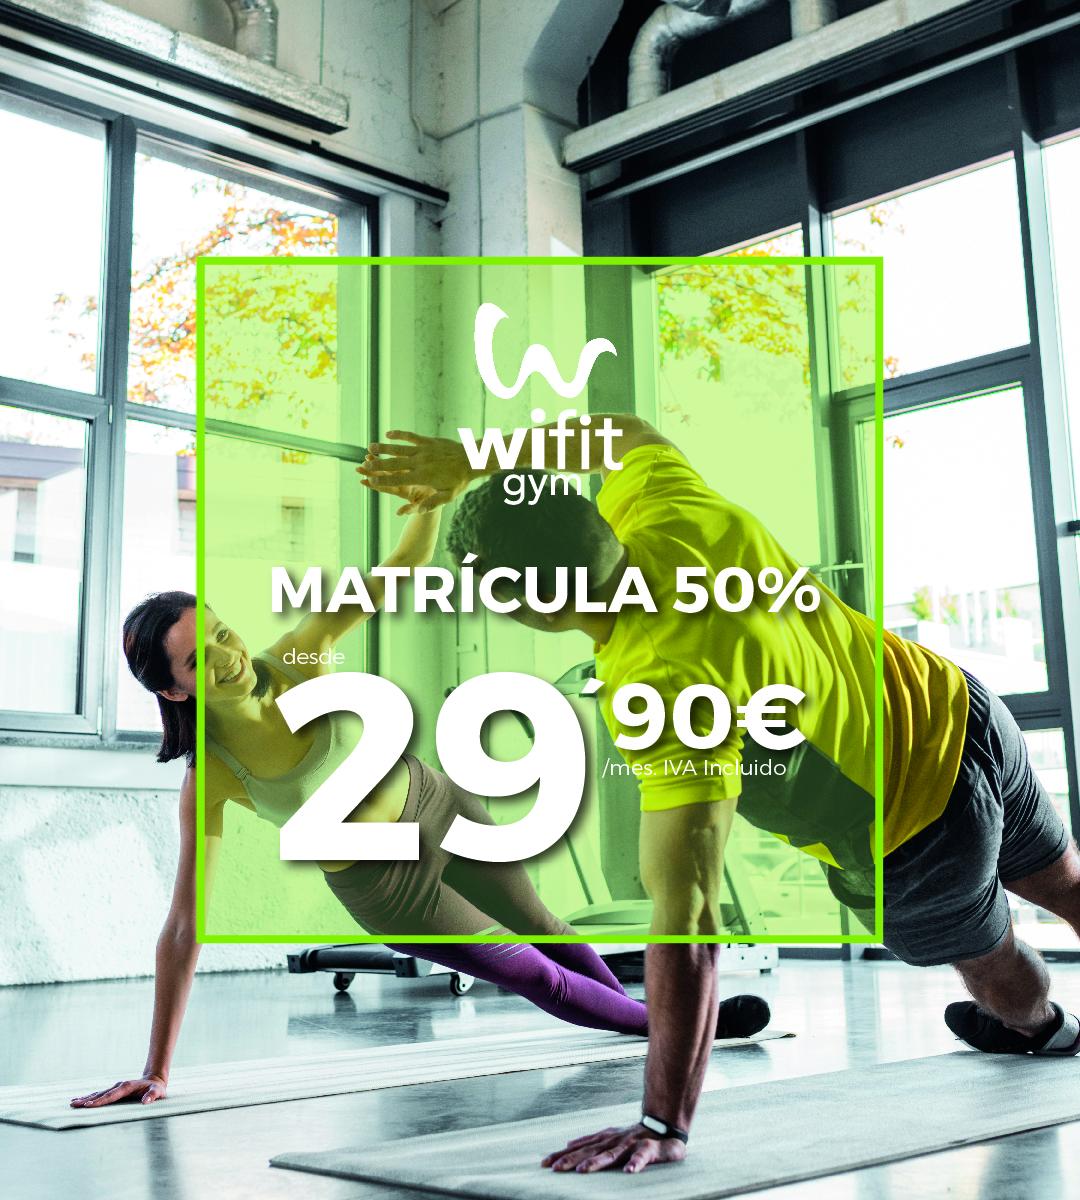 Matricula 50% wifit gym madrid